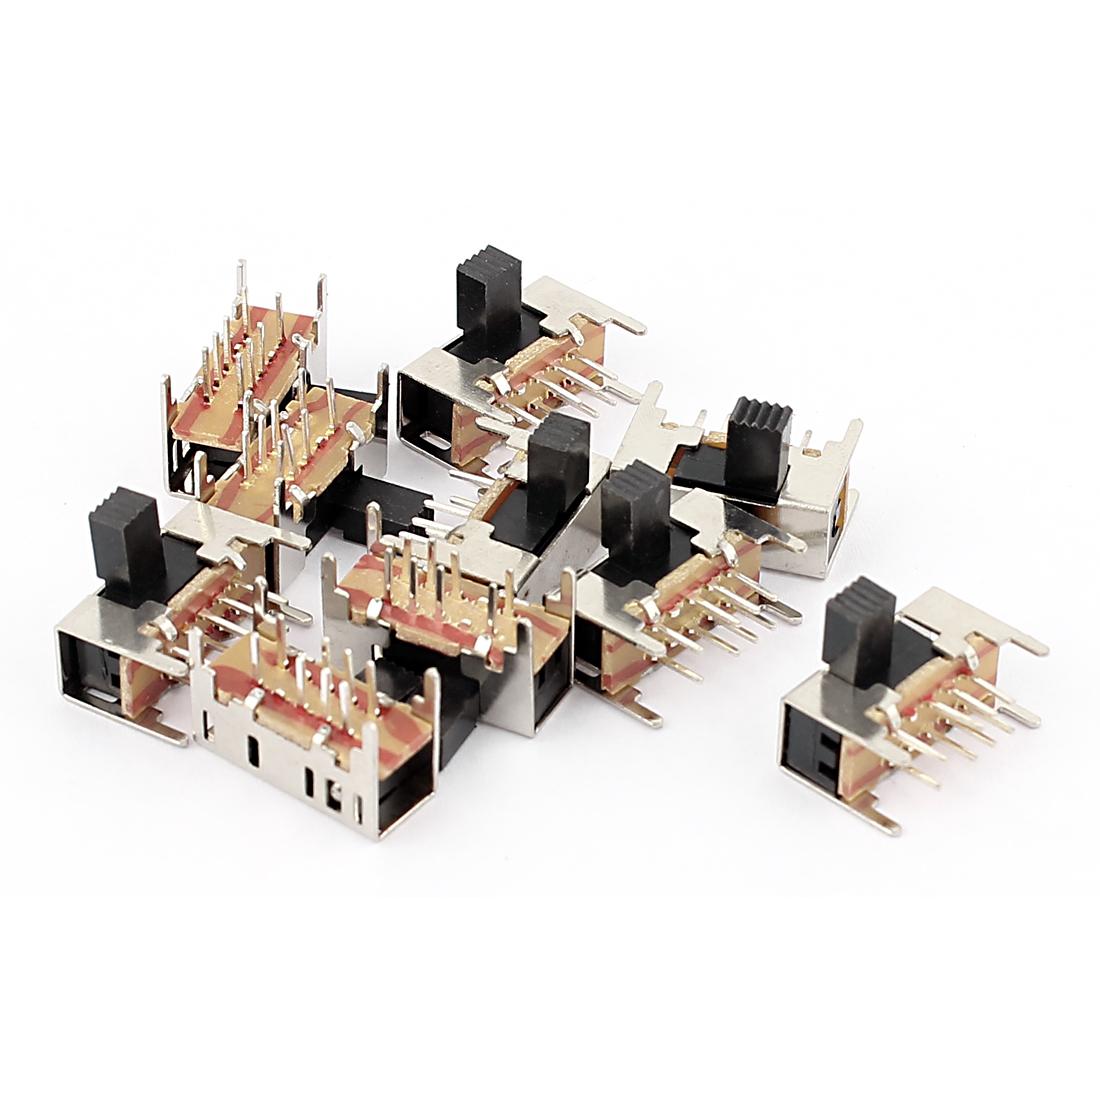 10 Pcs 3 Position 2P3T 8 Pin PCB Panel Mini Micro Right Angle Slide Switch